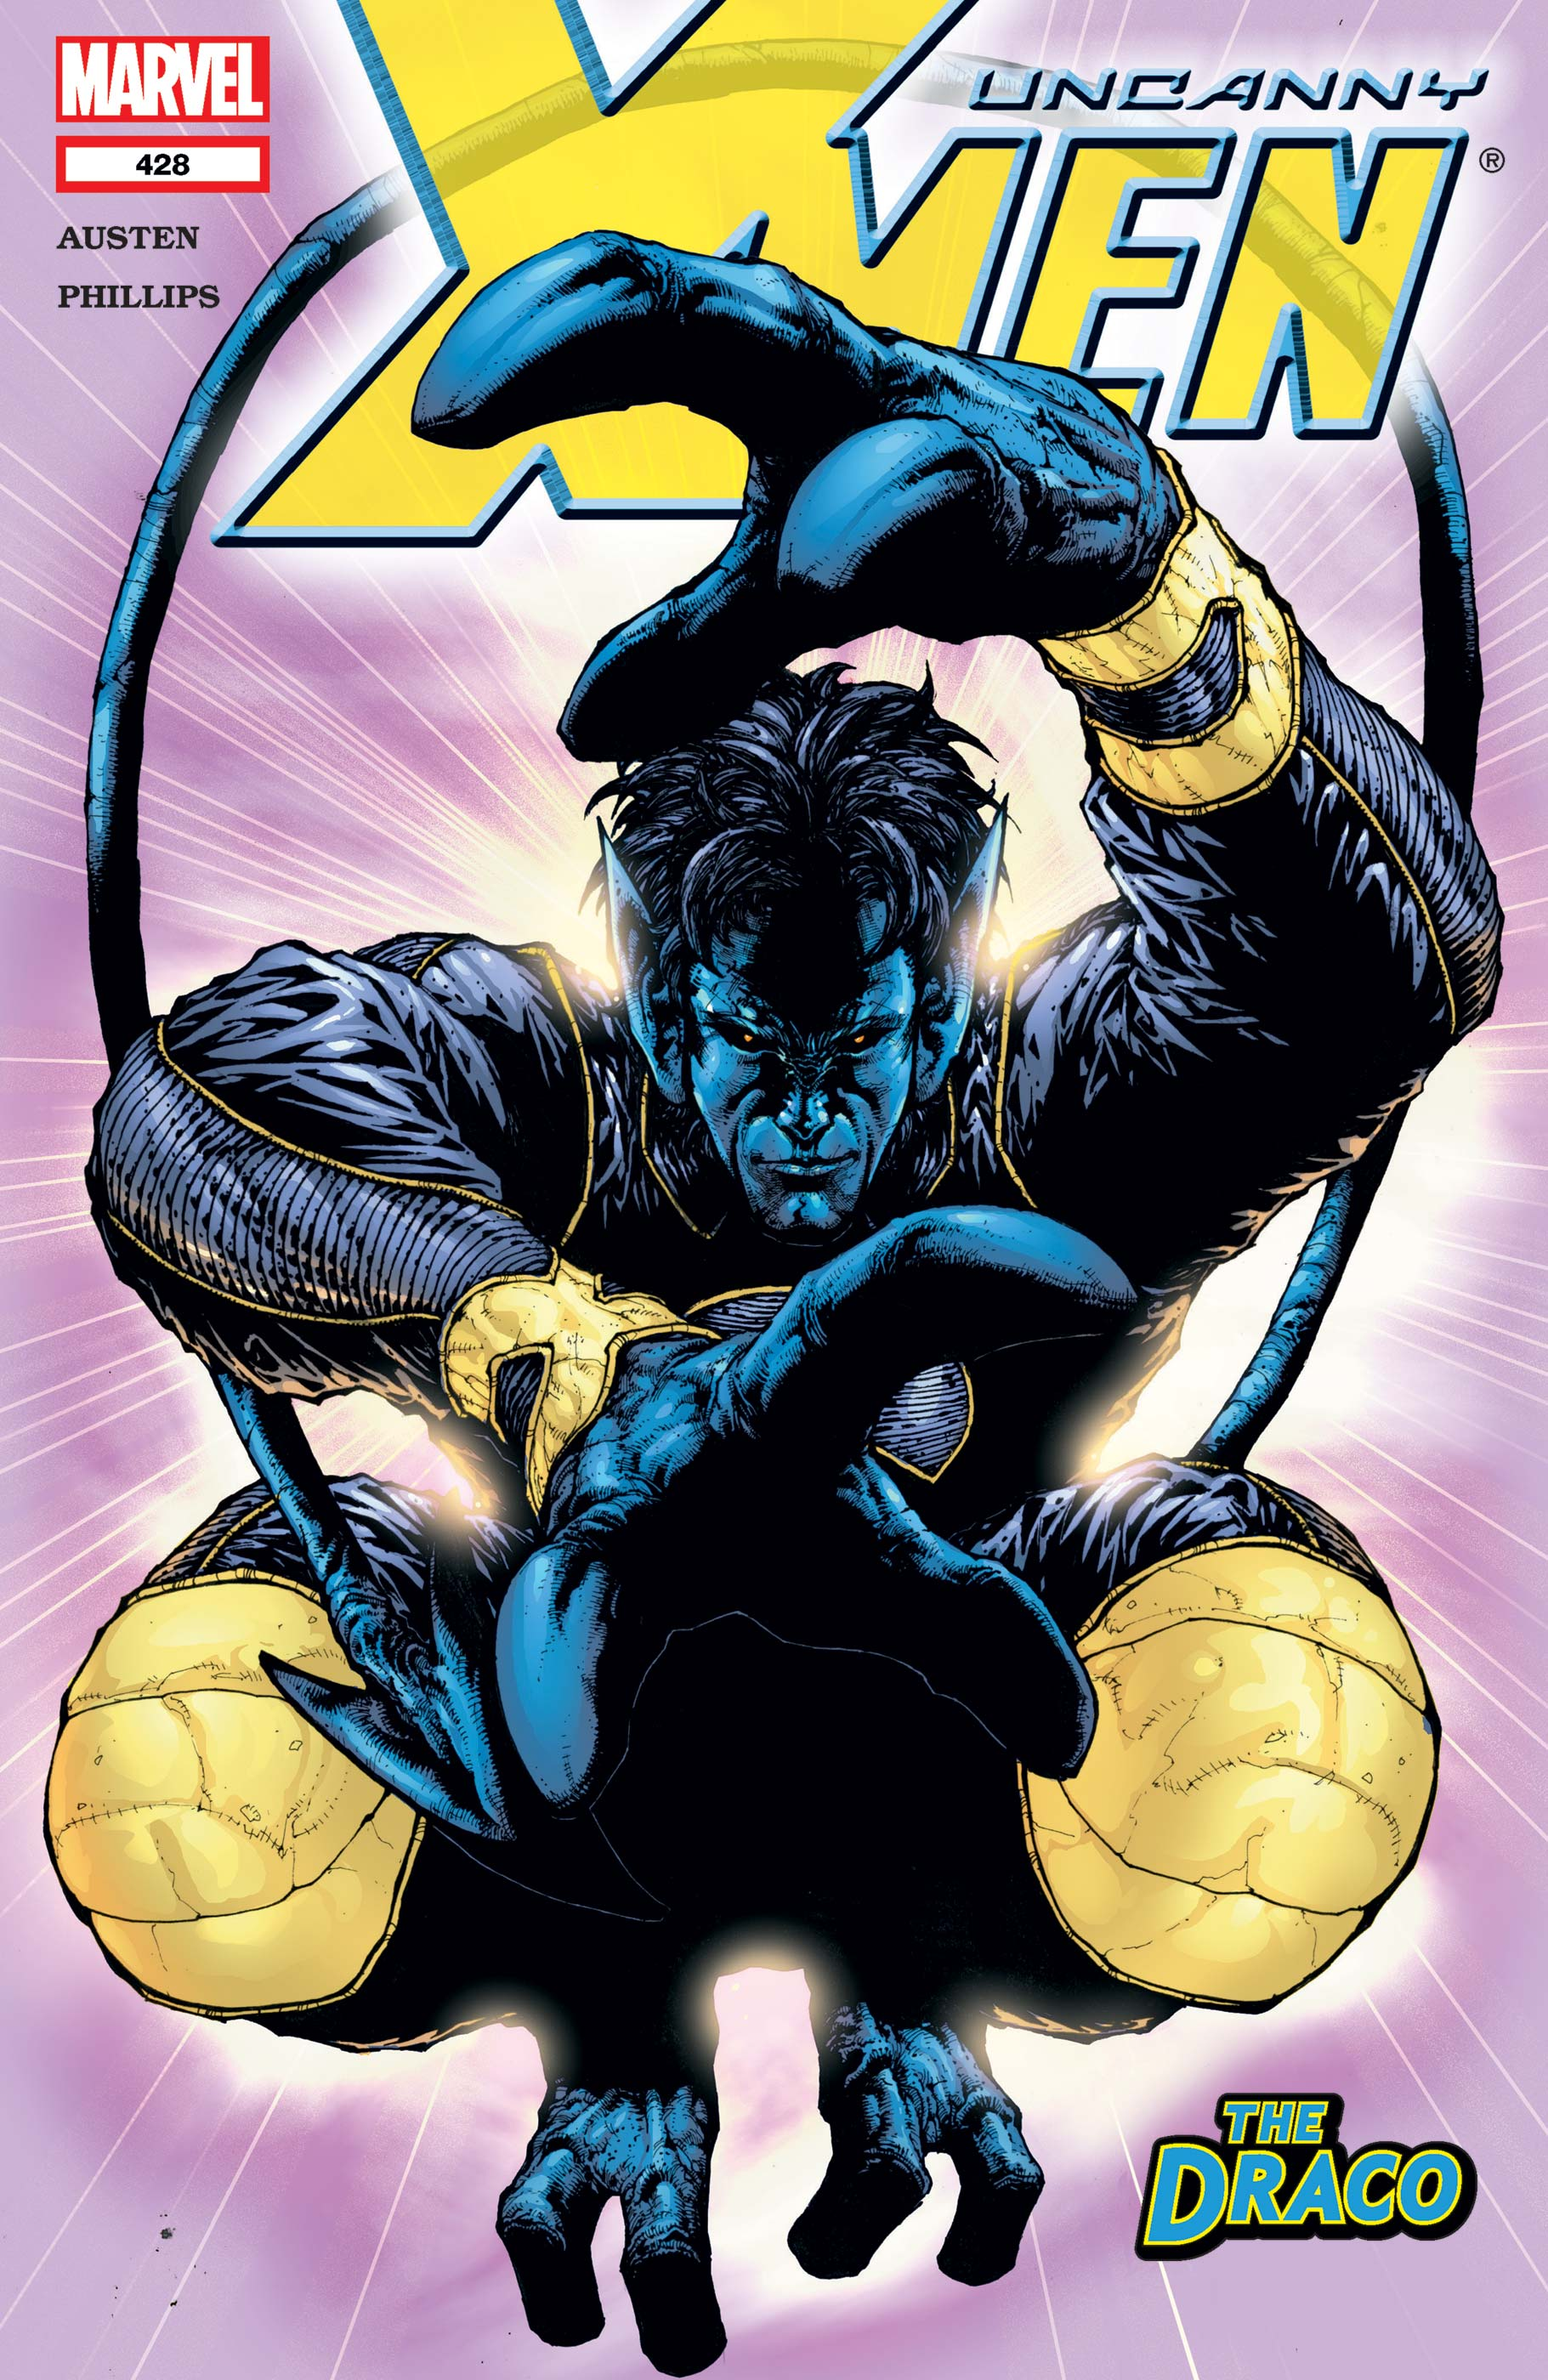 Uncanny X-Men (1963) #428